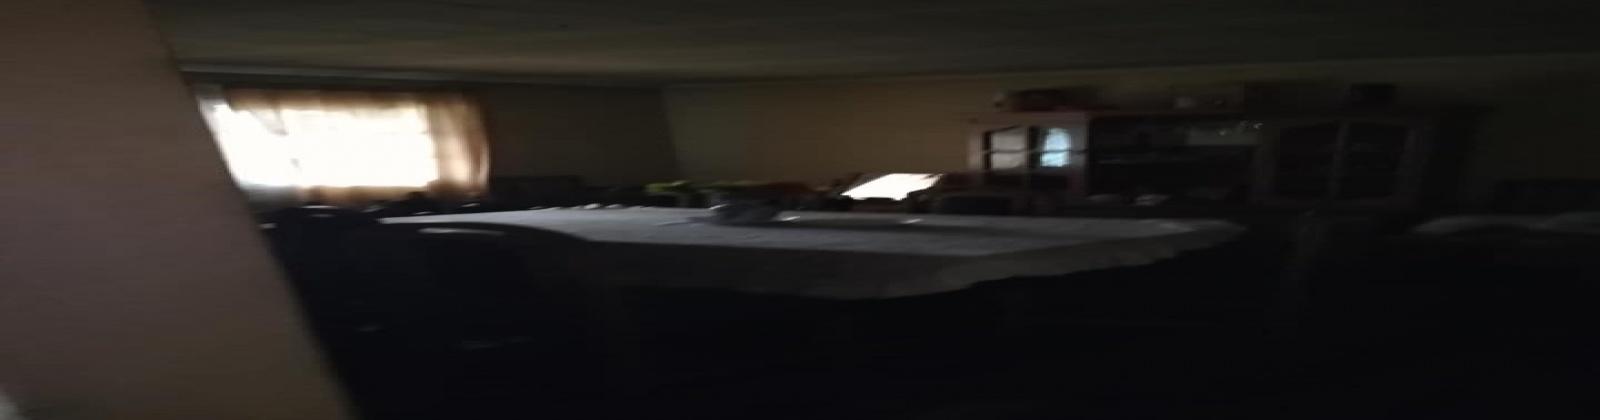 Georges Bizet, San Joaquin, R. Metropolitana, 3 Habitaciones Habitaciones, ,1 BañoBathrooms,Casa,Venta,Georges Bizet,1050